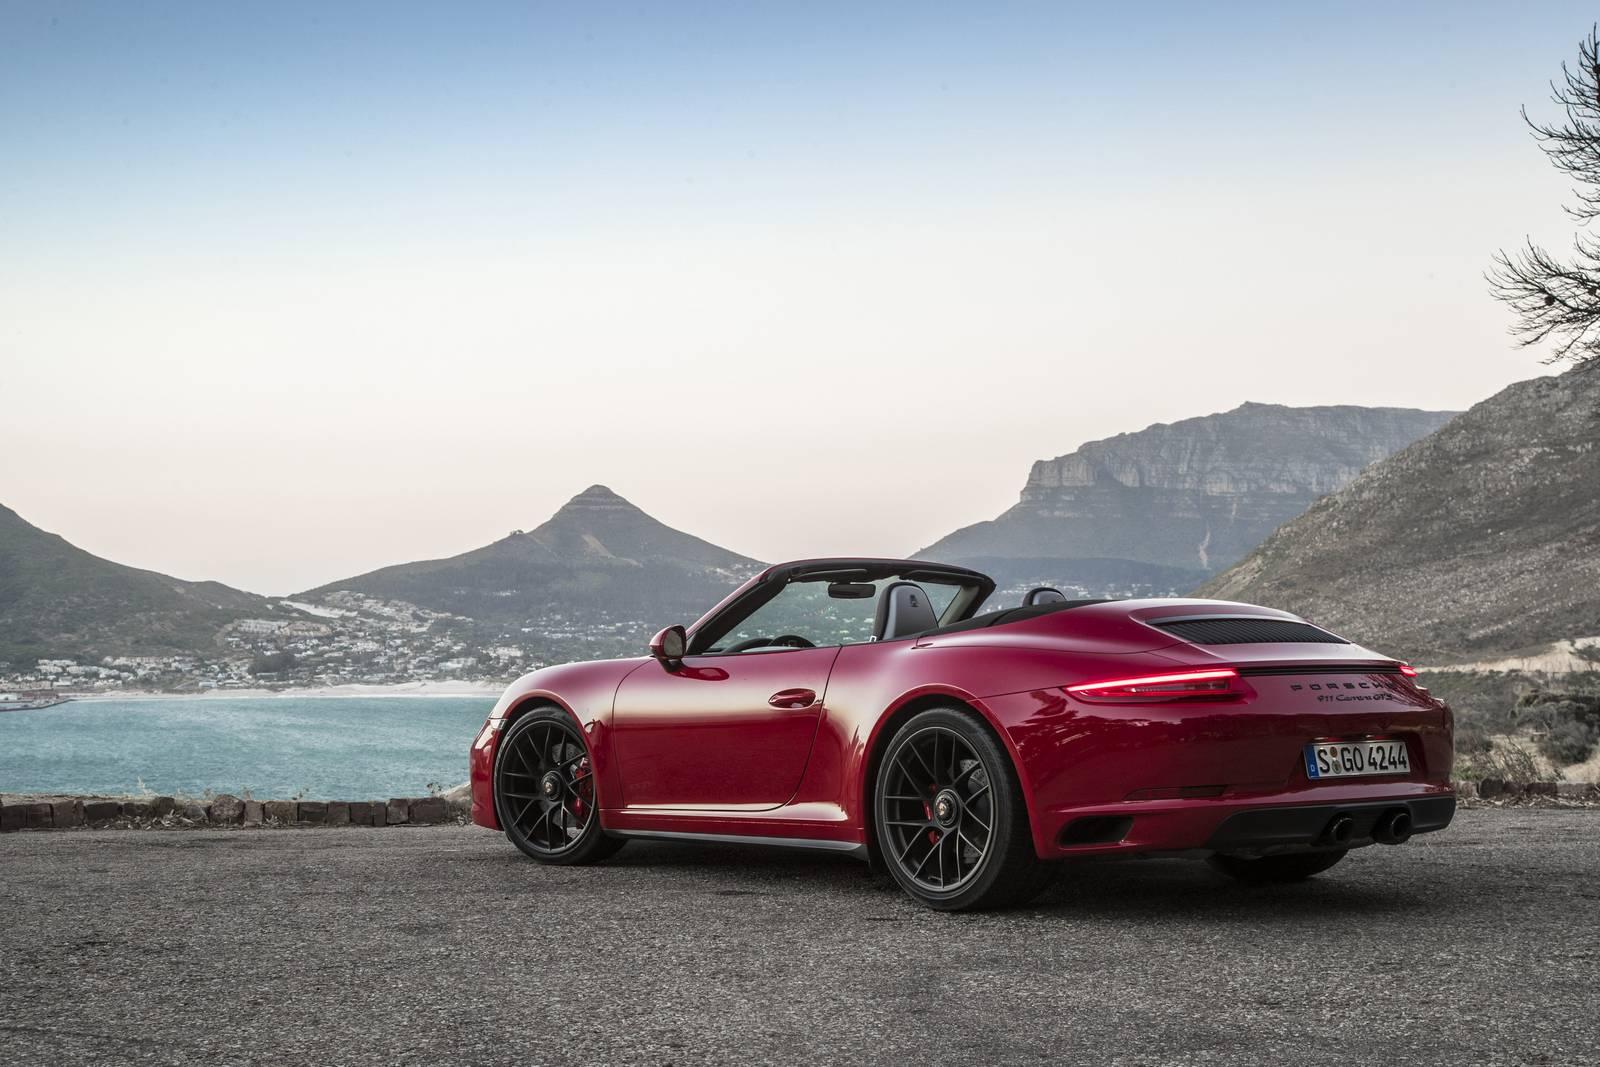 2017 porsche 911 carrera 4 gts review gtspirit. Black Bedroom Furniture Sets. Home Design Ideas